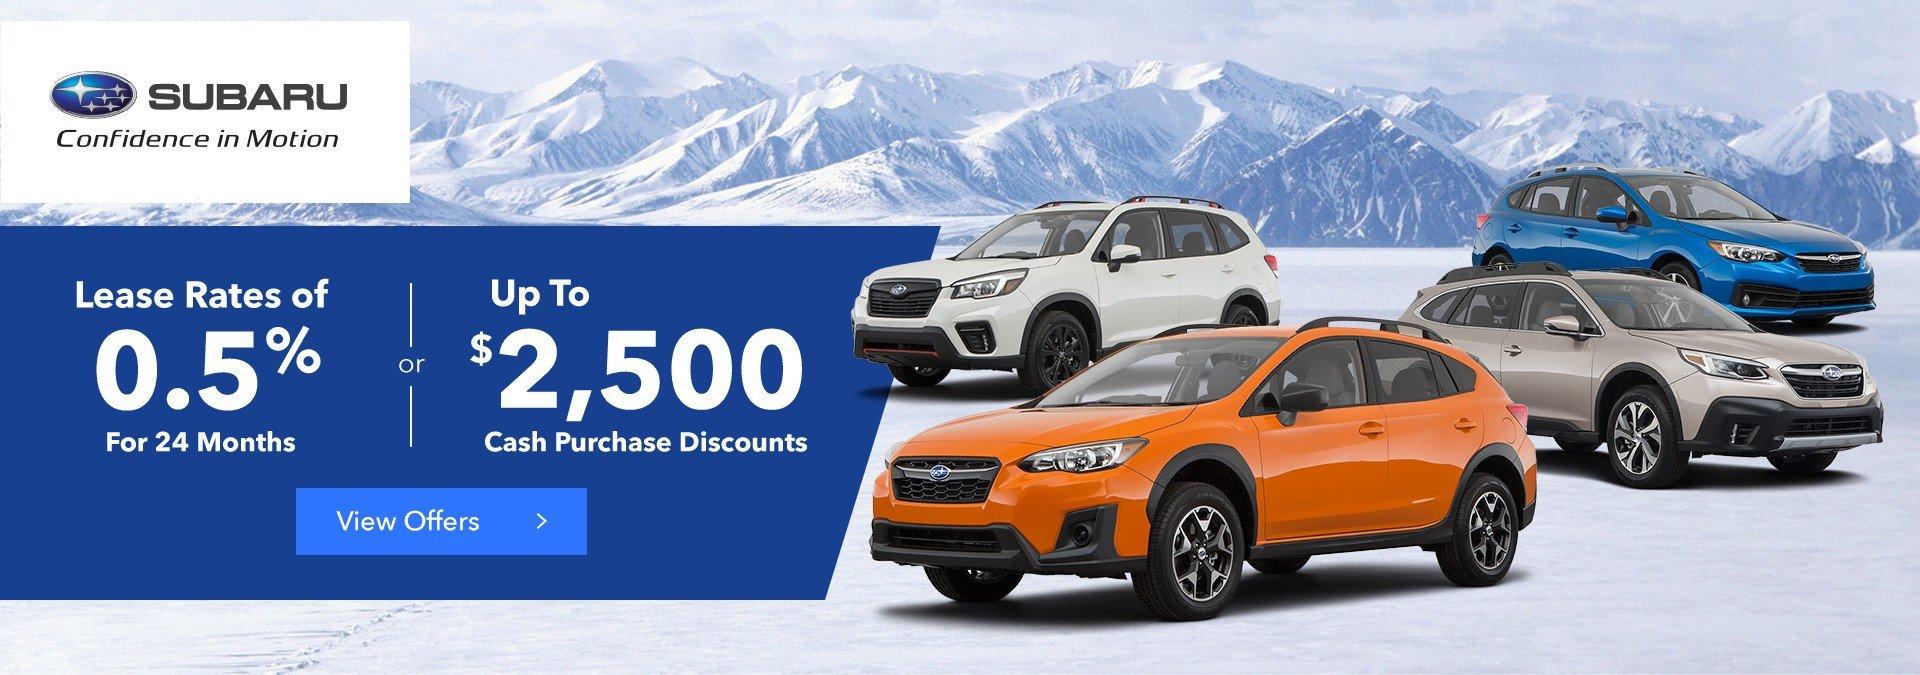 Subaru OEM Promotion Dec 2020